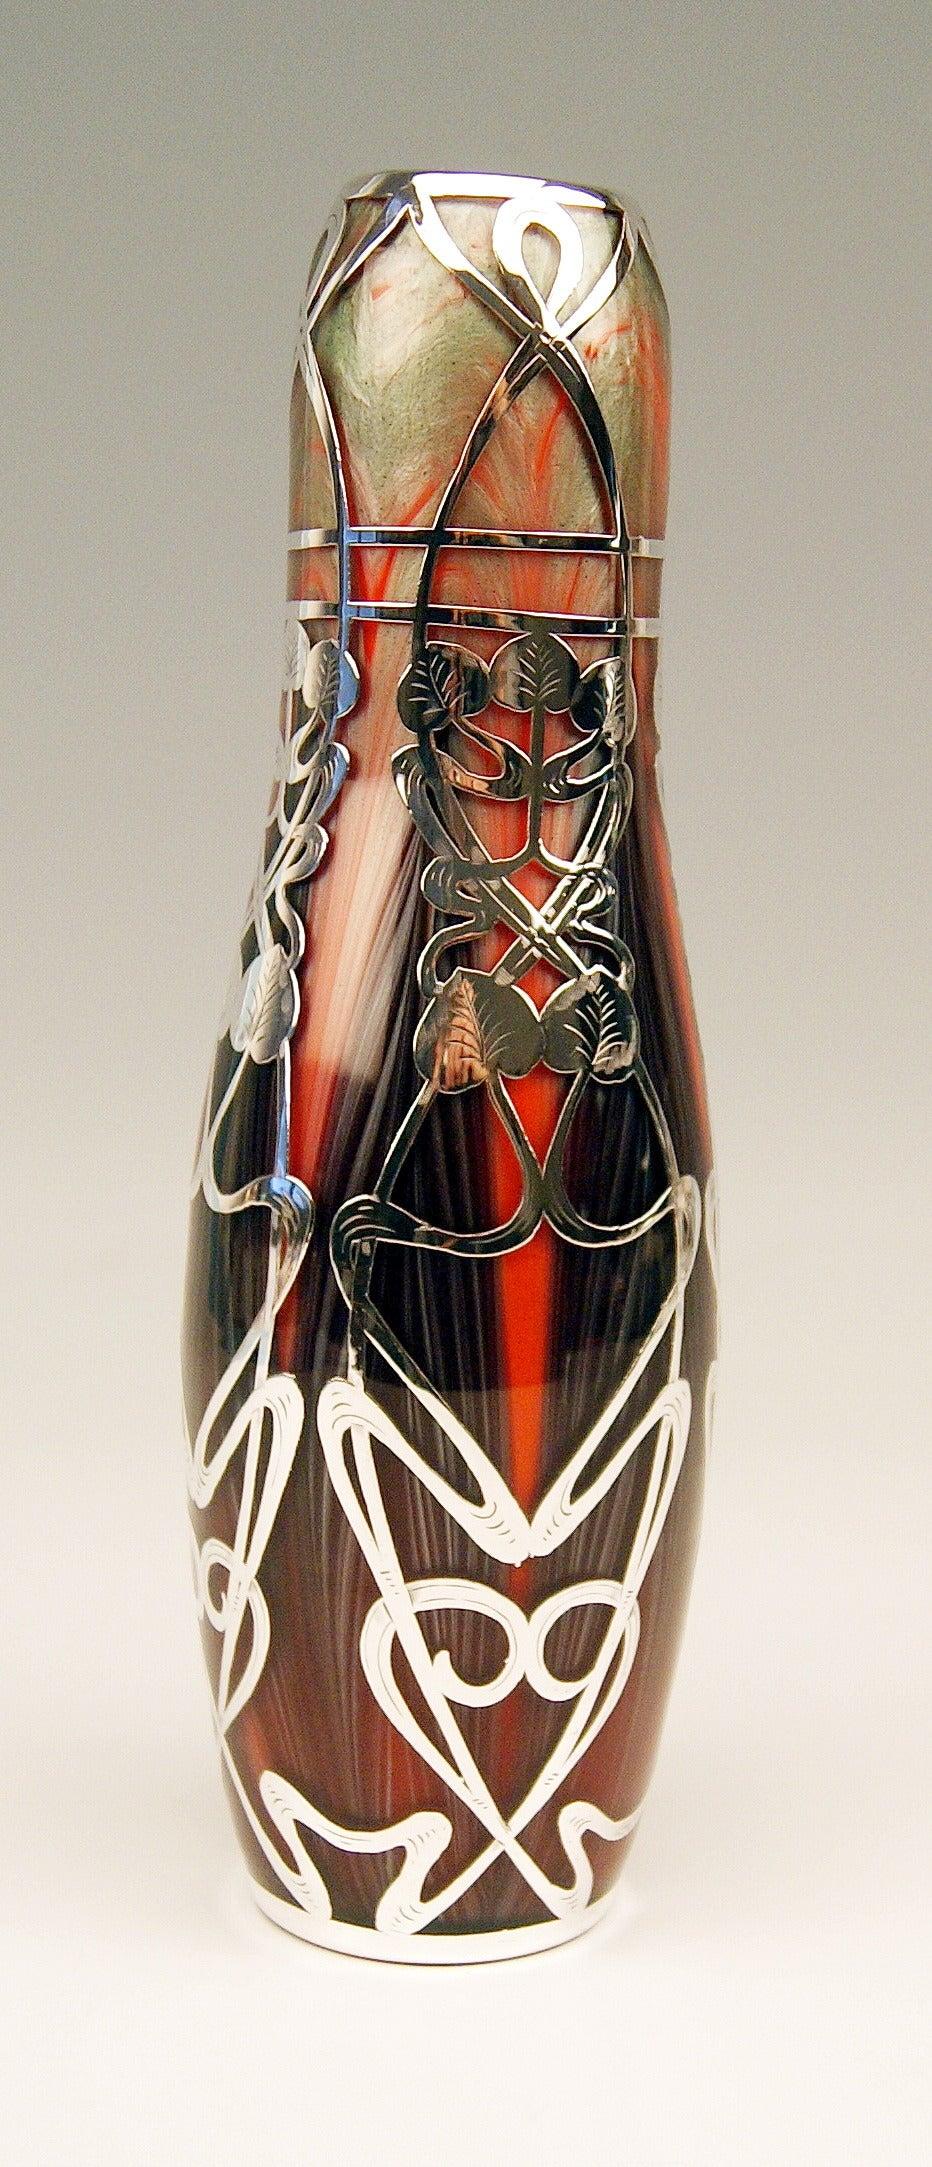 Austrian Vase Loetz Widow Art Nouveau, Titania Gre 2512 Silver Overlay, circa 1906 For Sale